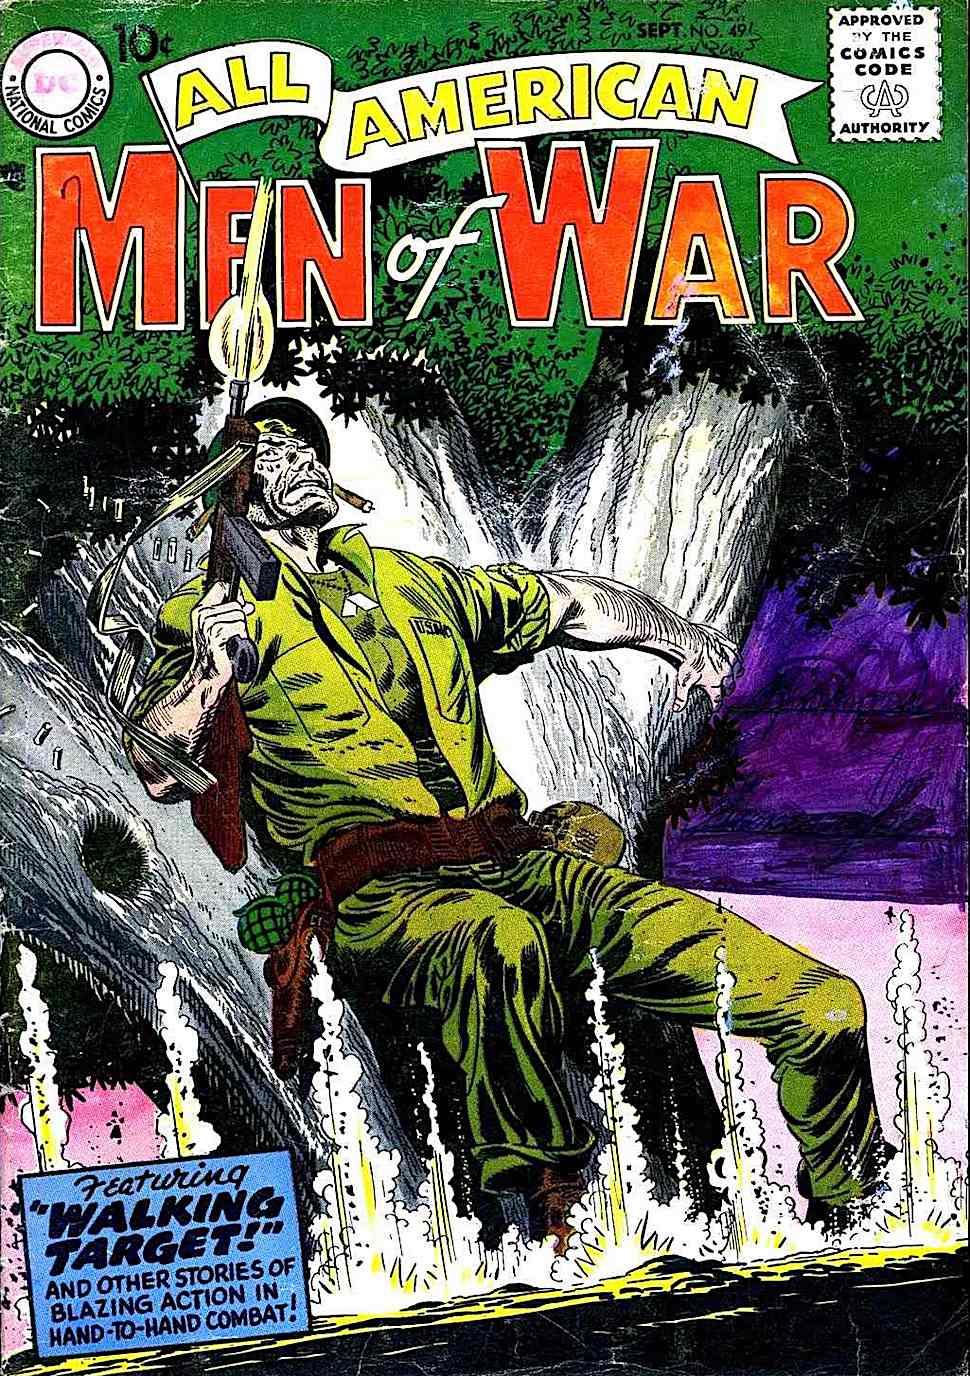 a Jerry Grandenetti 1960s comic book cover for Men Of War #49